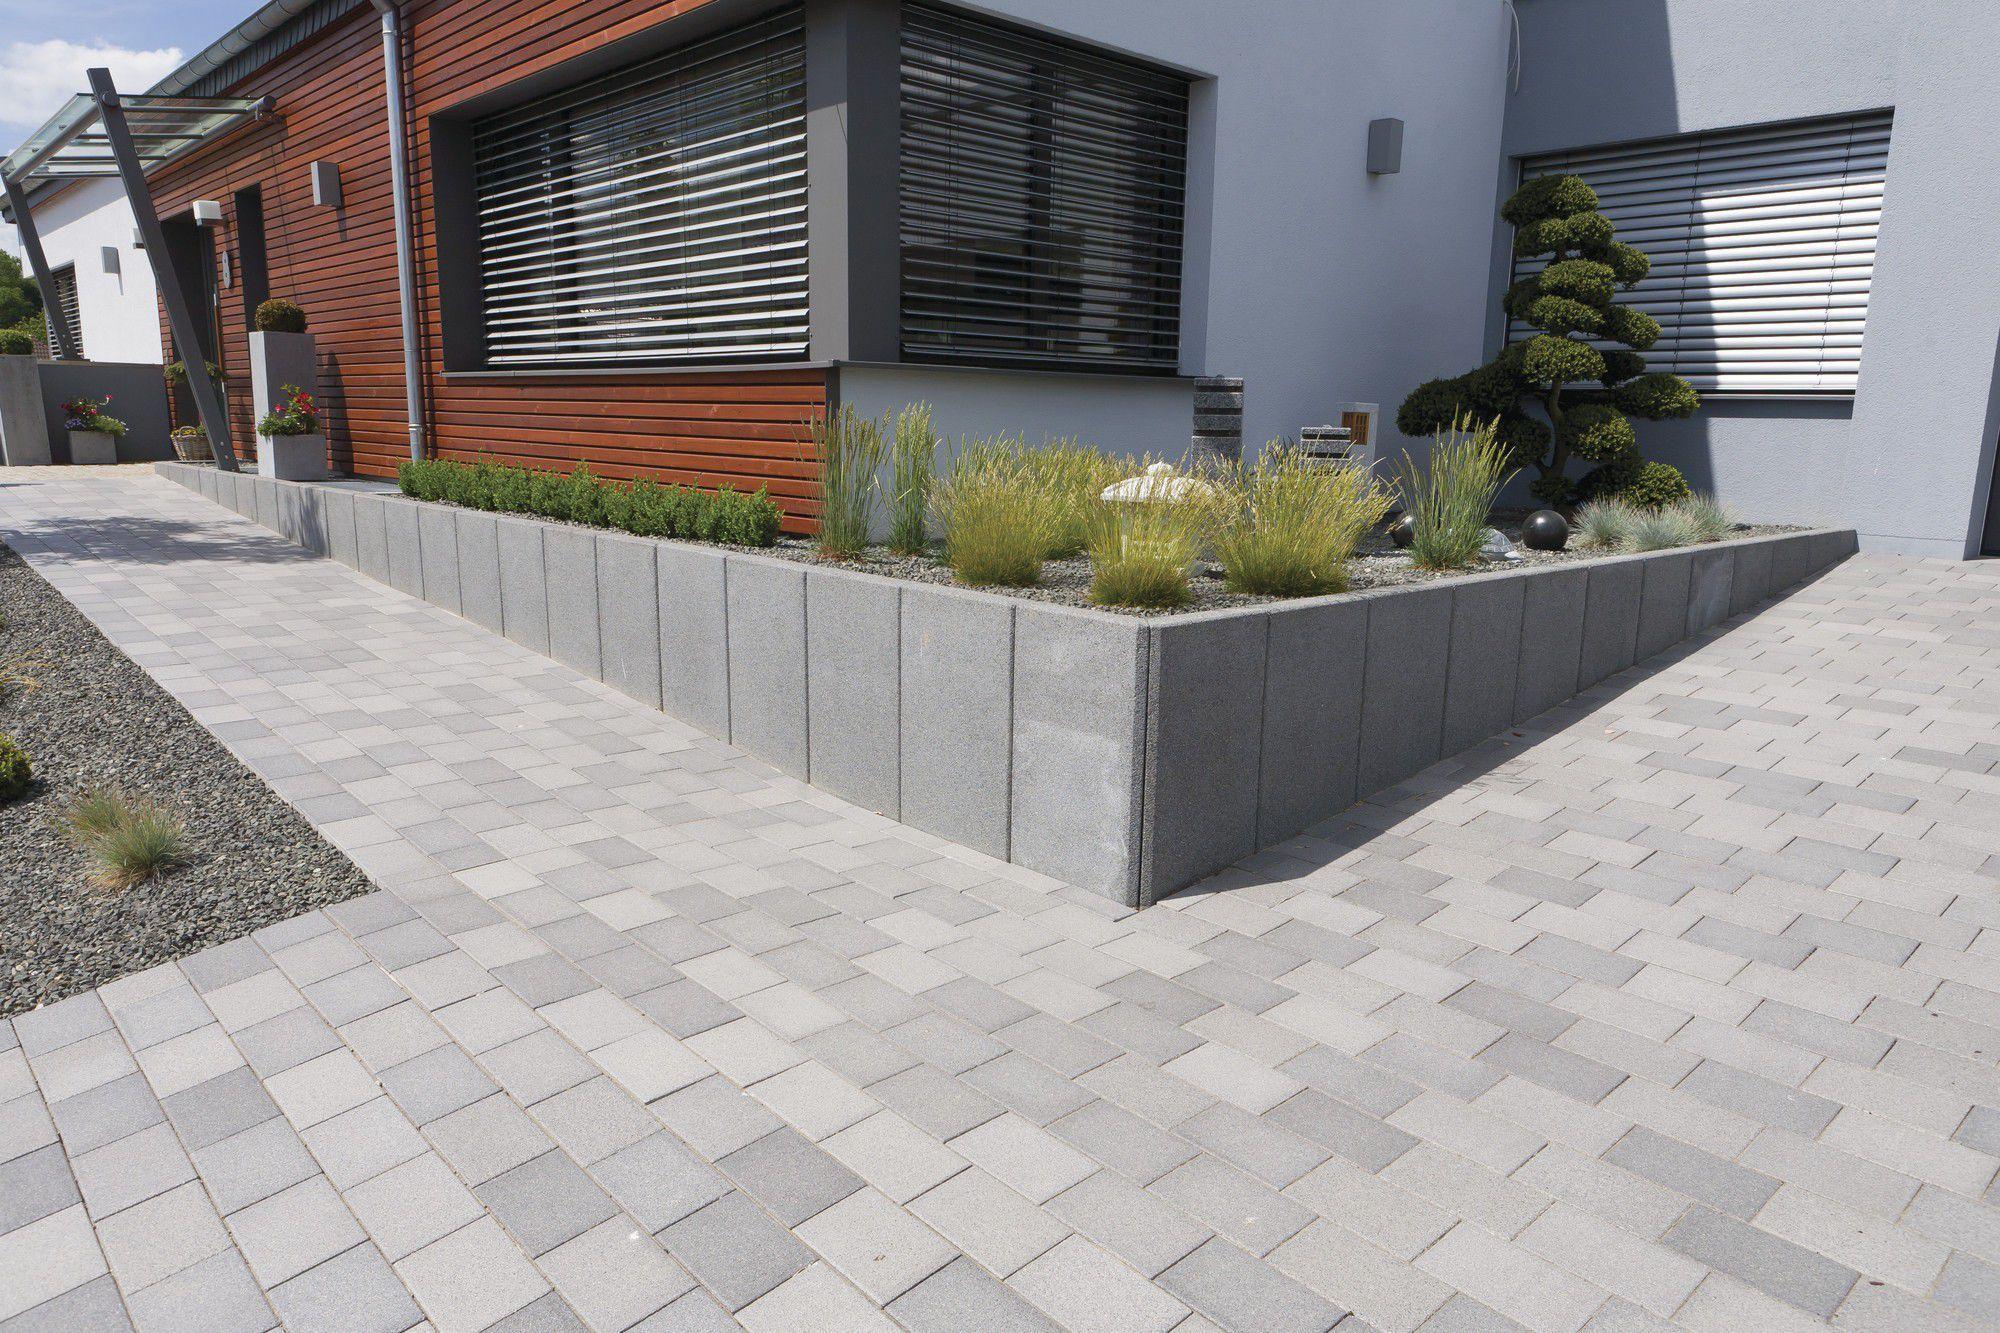 permeable paver for public spaces hydropor padio rinn beton und naturstein stadtroda. Black Bedroom Furniture Sets. Home Design Ideas